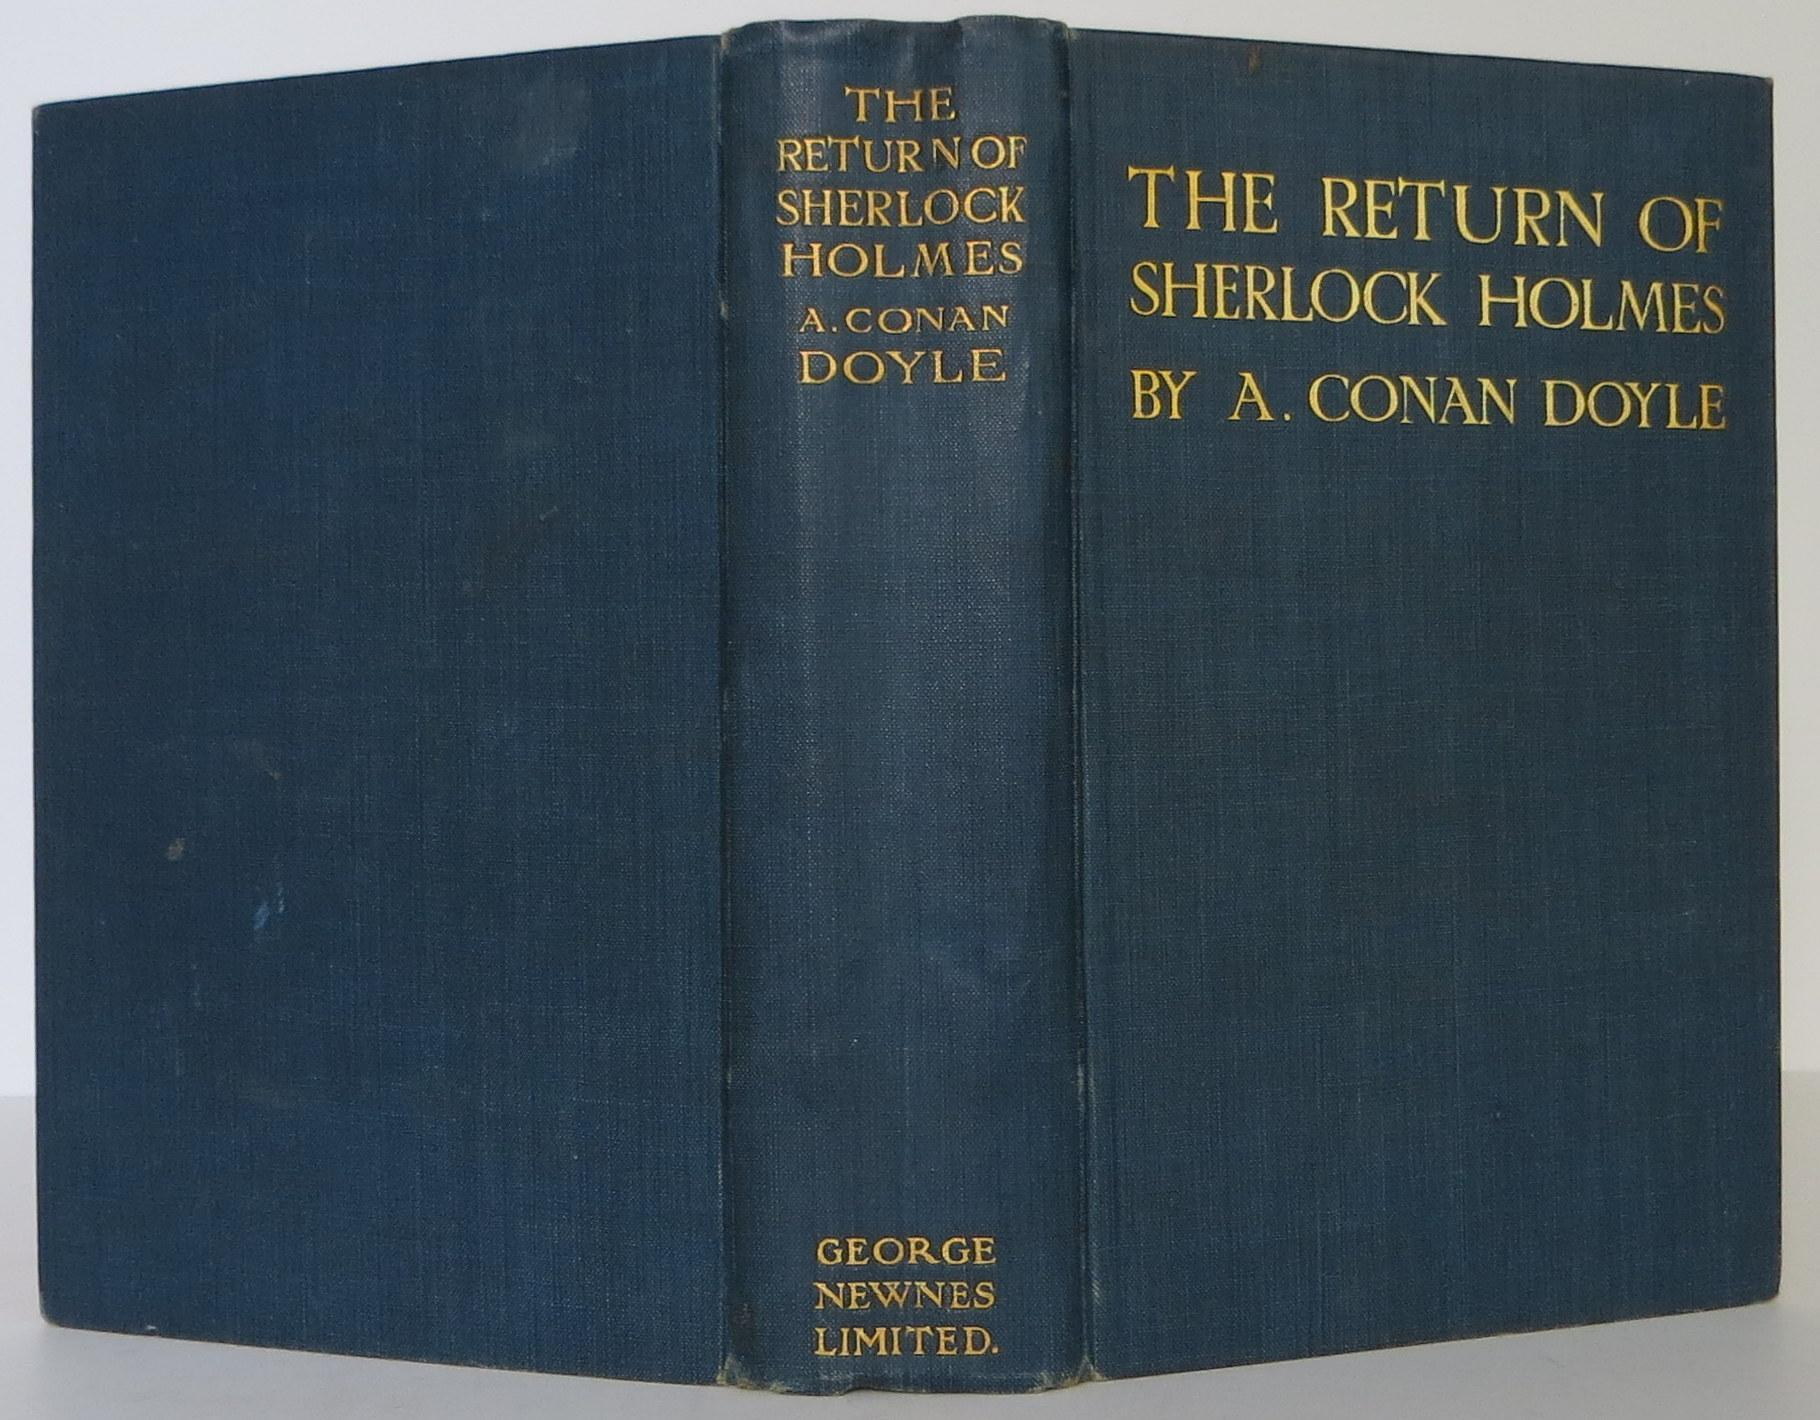 The Return of Sherlock Holmes Doyle, Arthur Conan